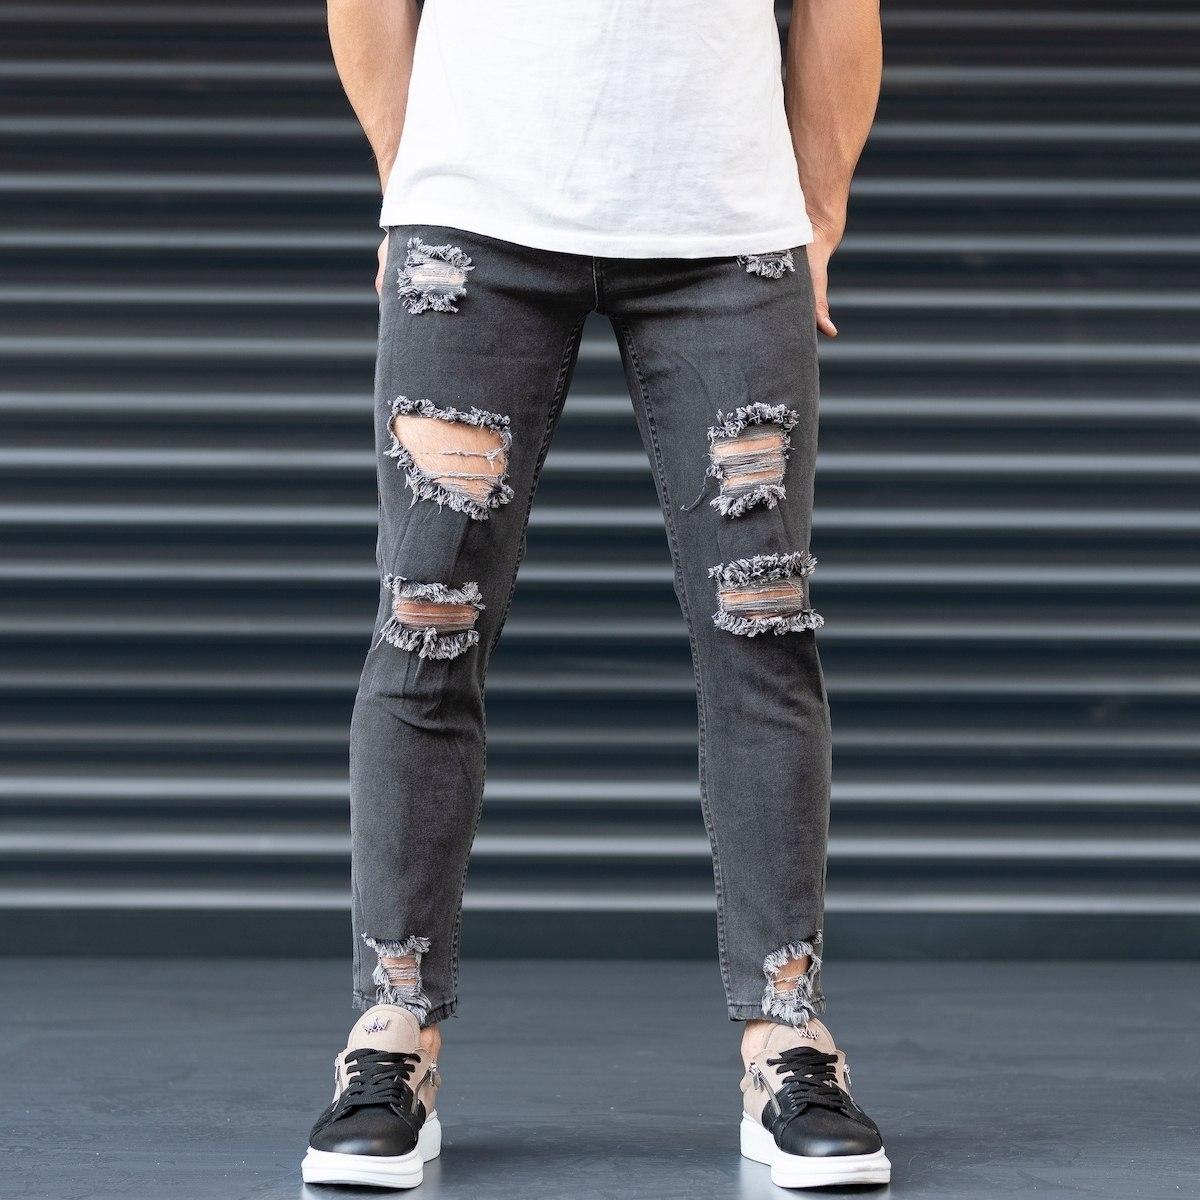 Men's Coal-Black Ripped Jeans